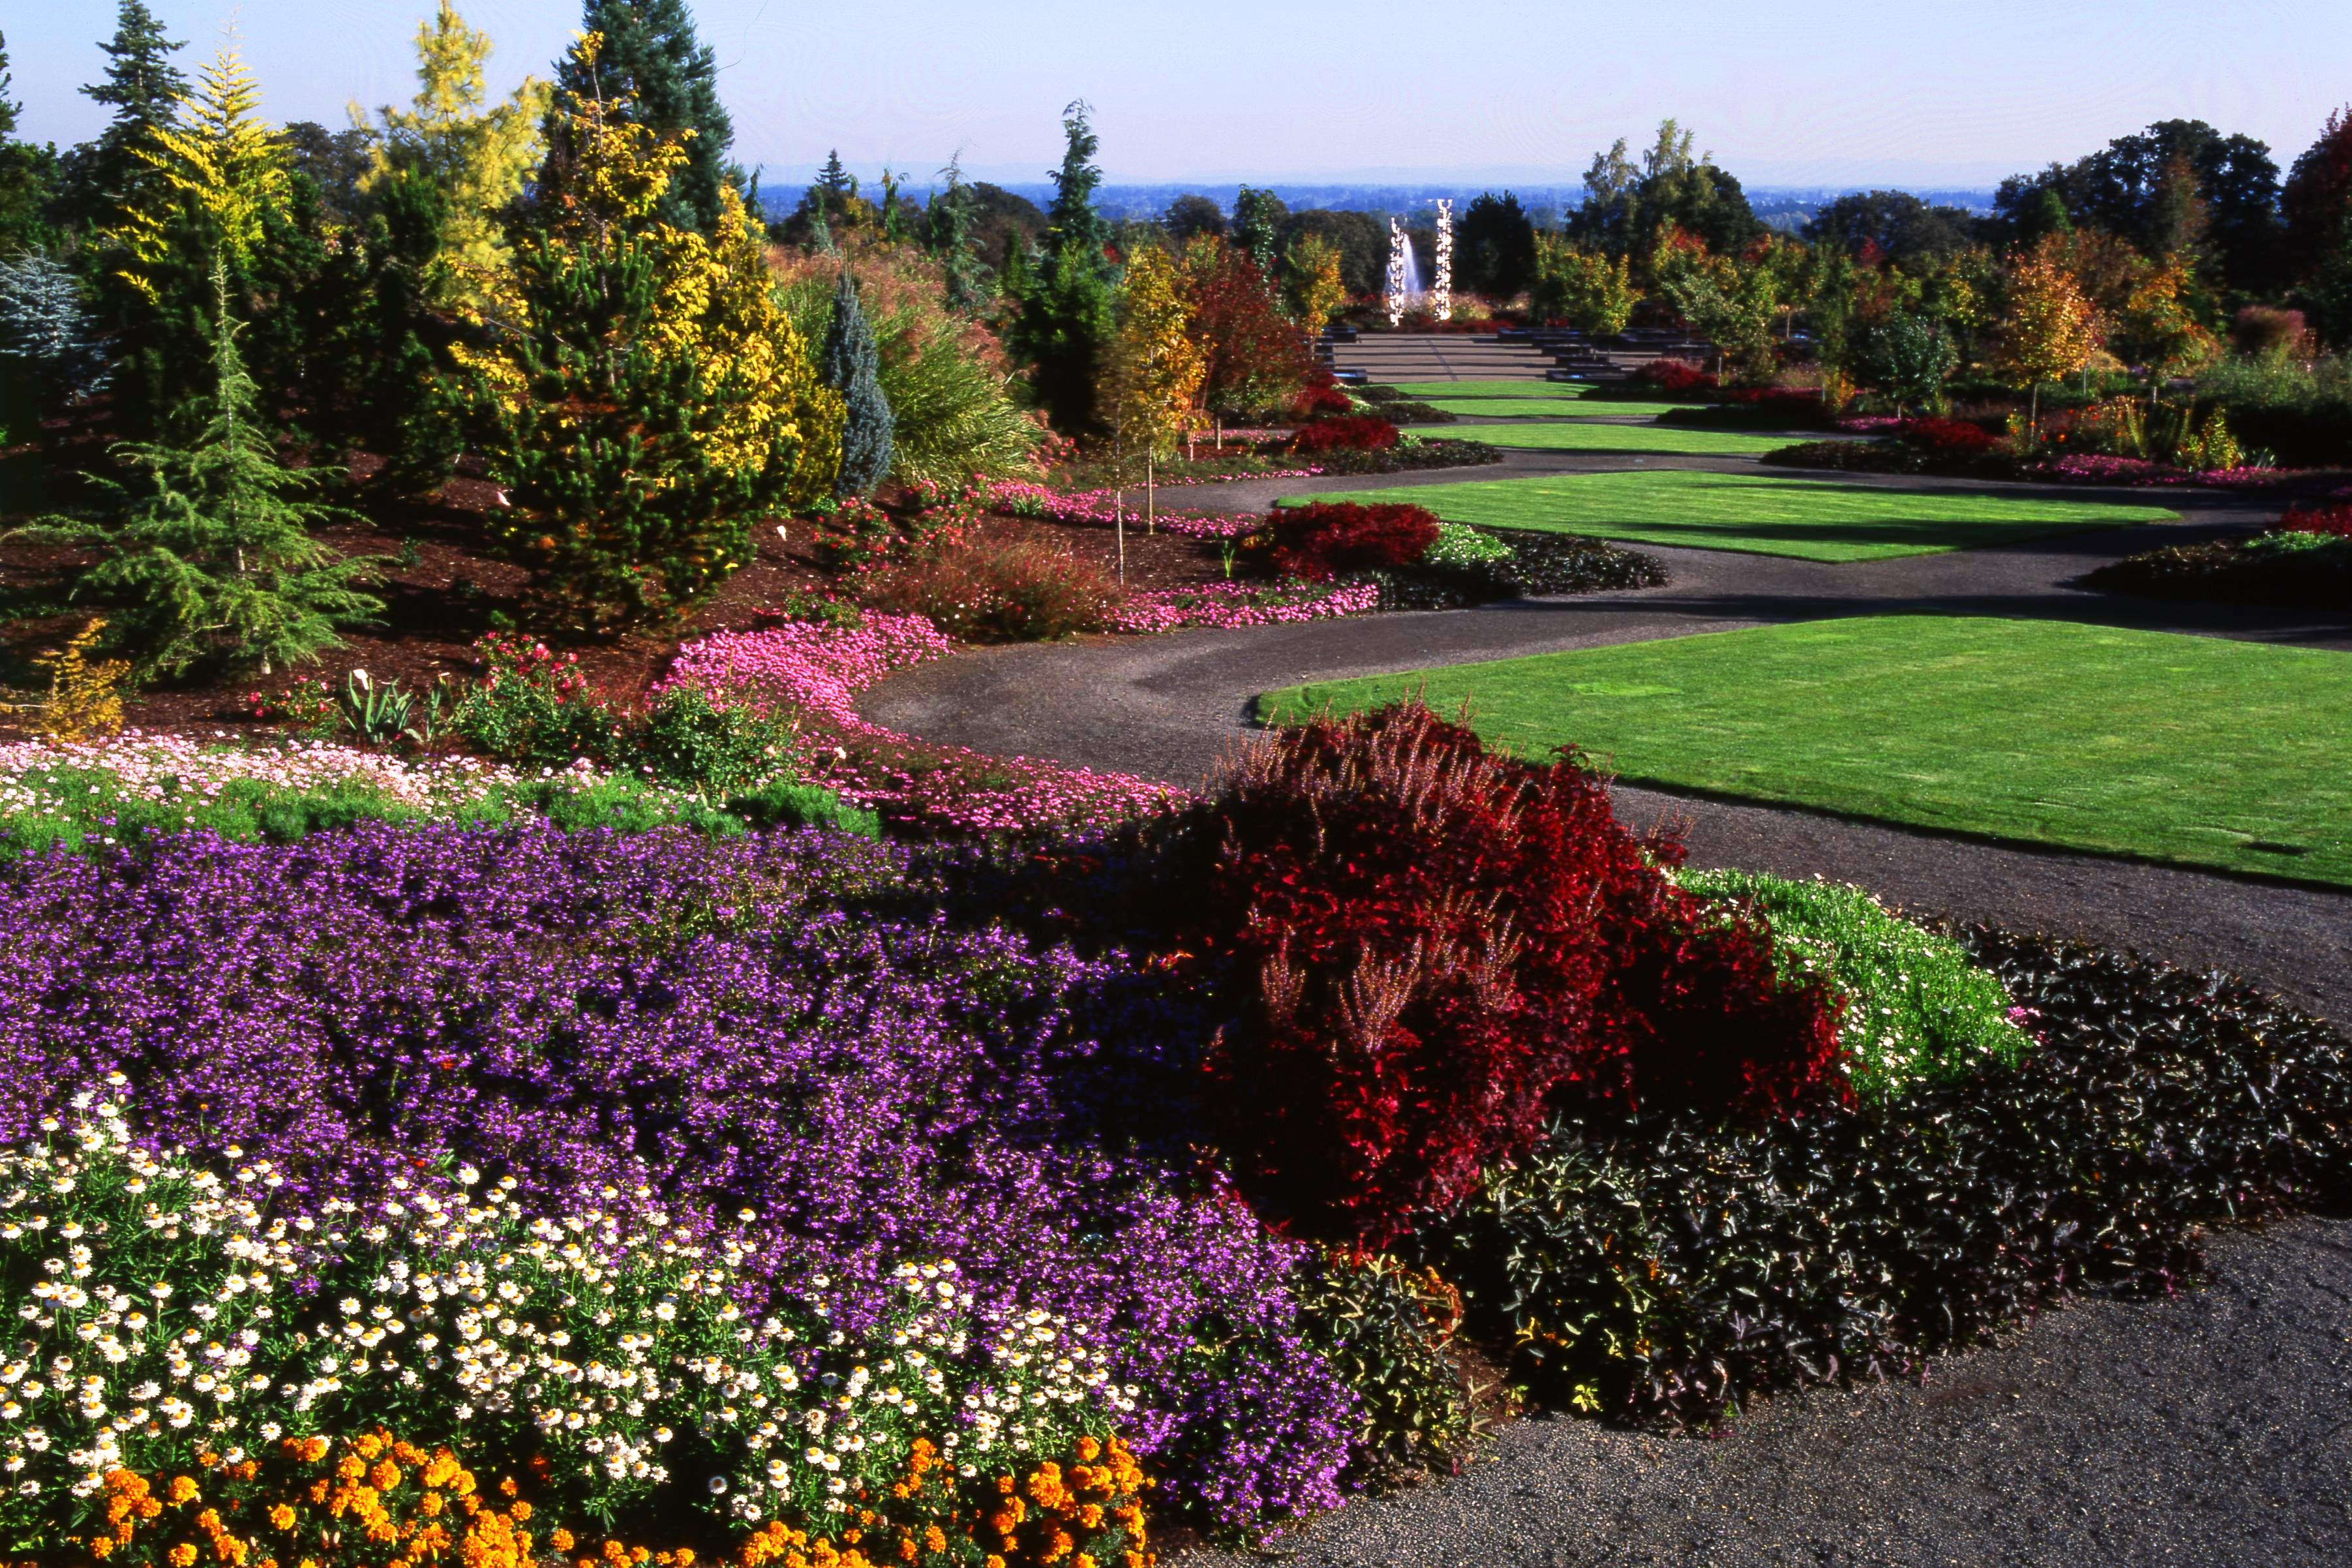 Oregon Garden photo by Travel Salem